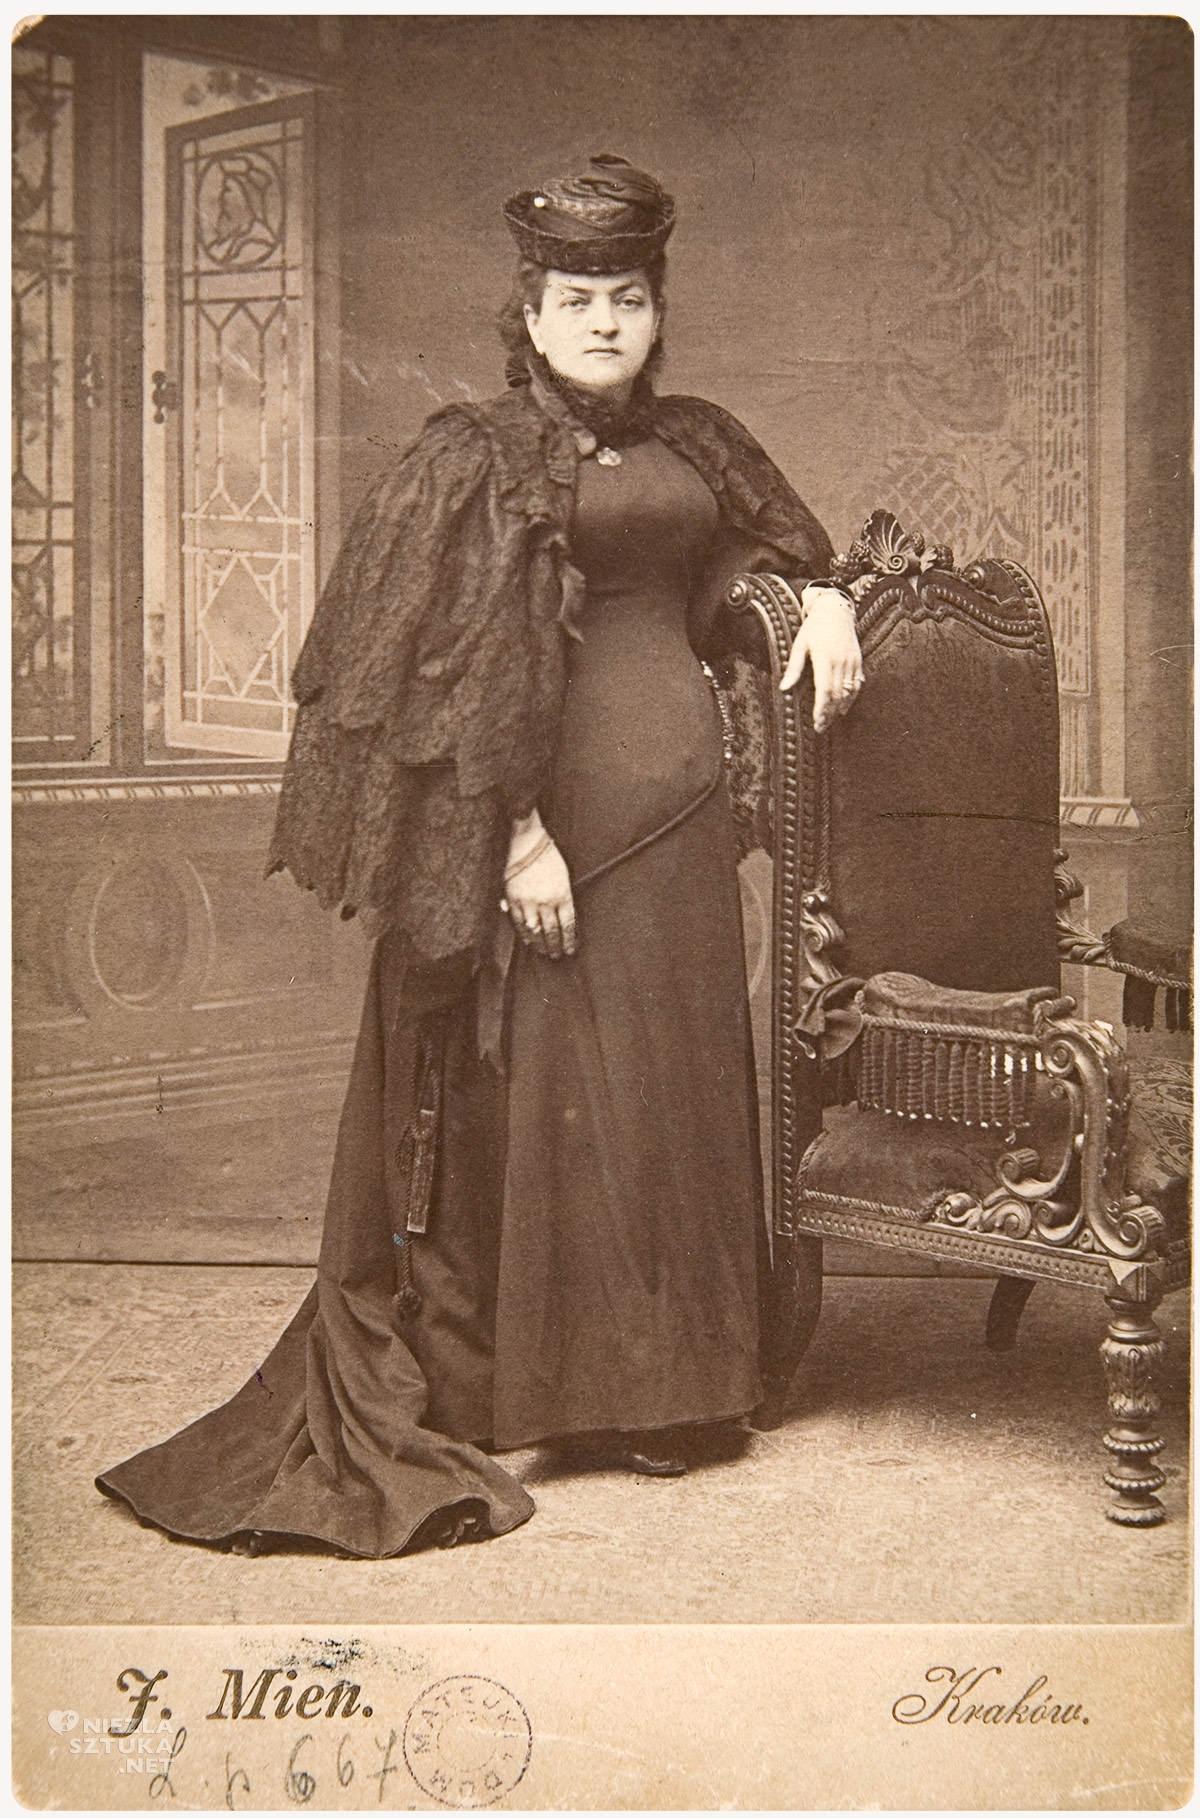 Teodora Matejko, Jan Matejko, żona, Muzeum Narodowe w Krakowie, Niezła sztuka